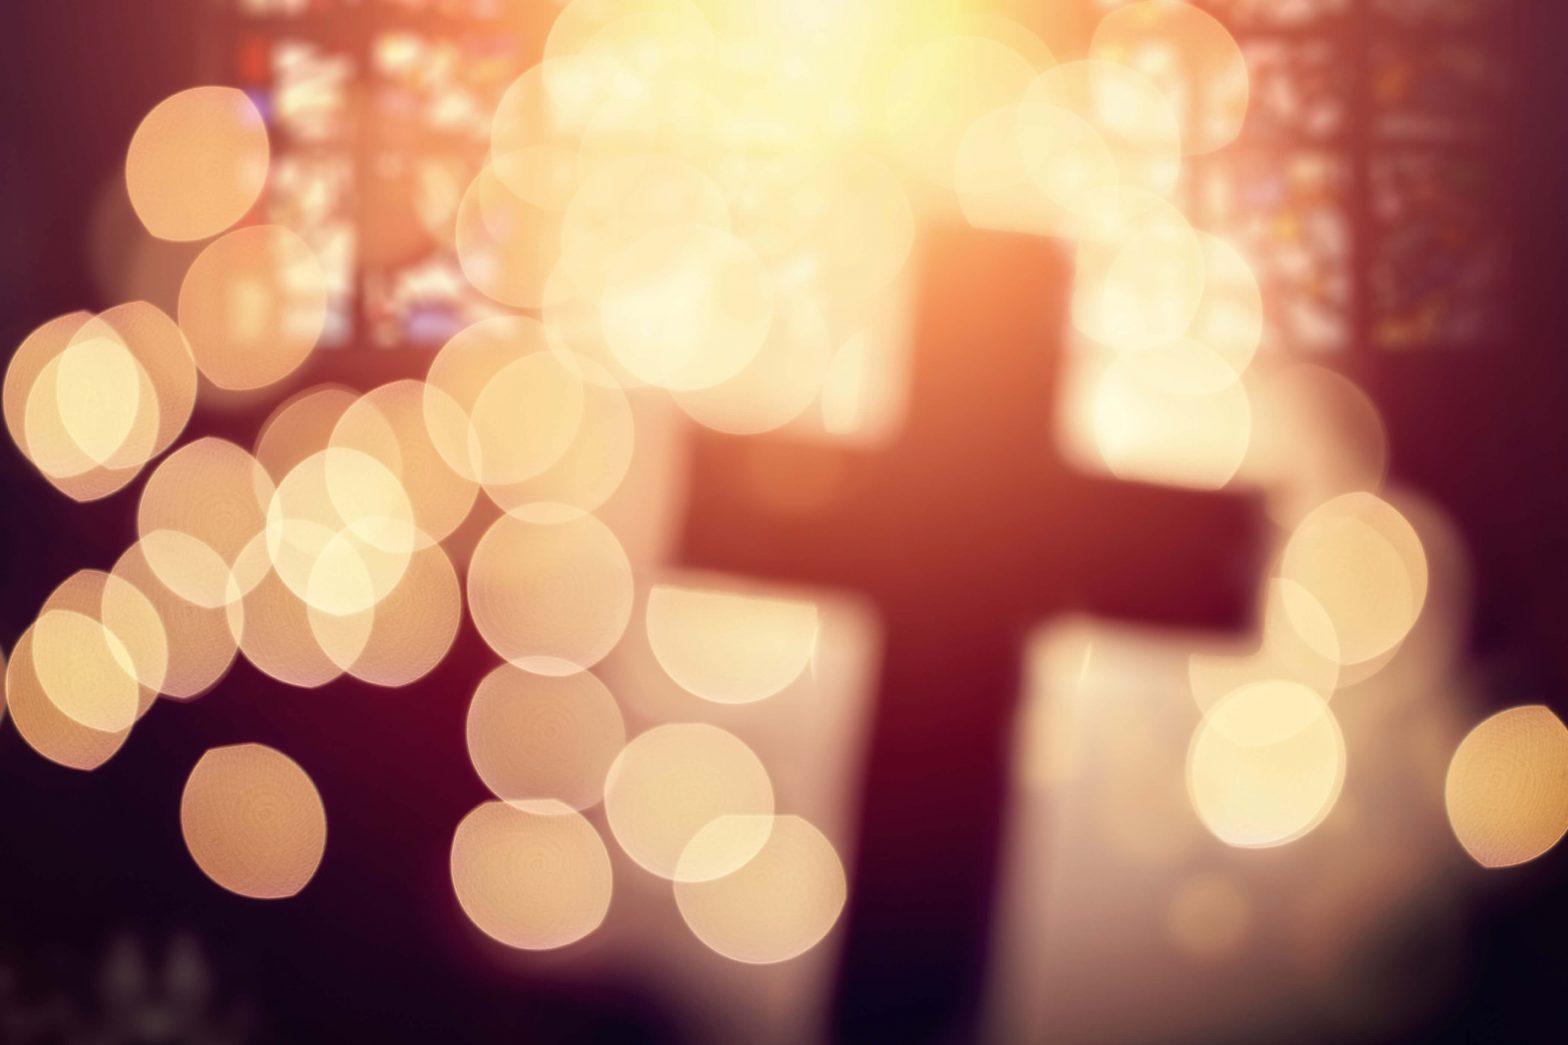 Daily Mass – The Word Among Us.